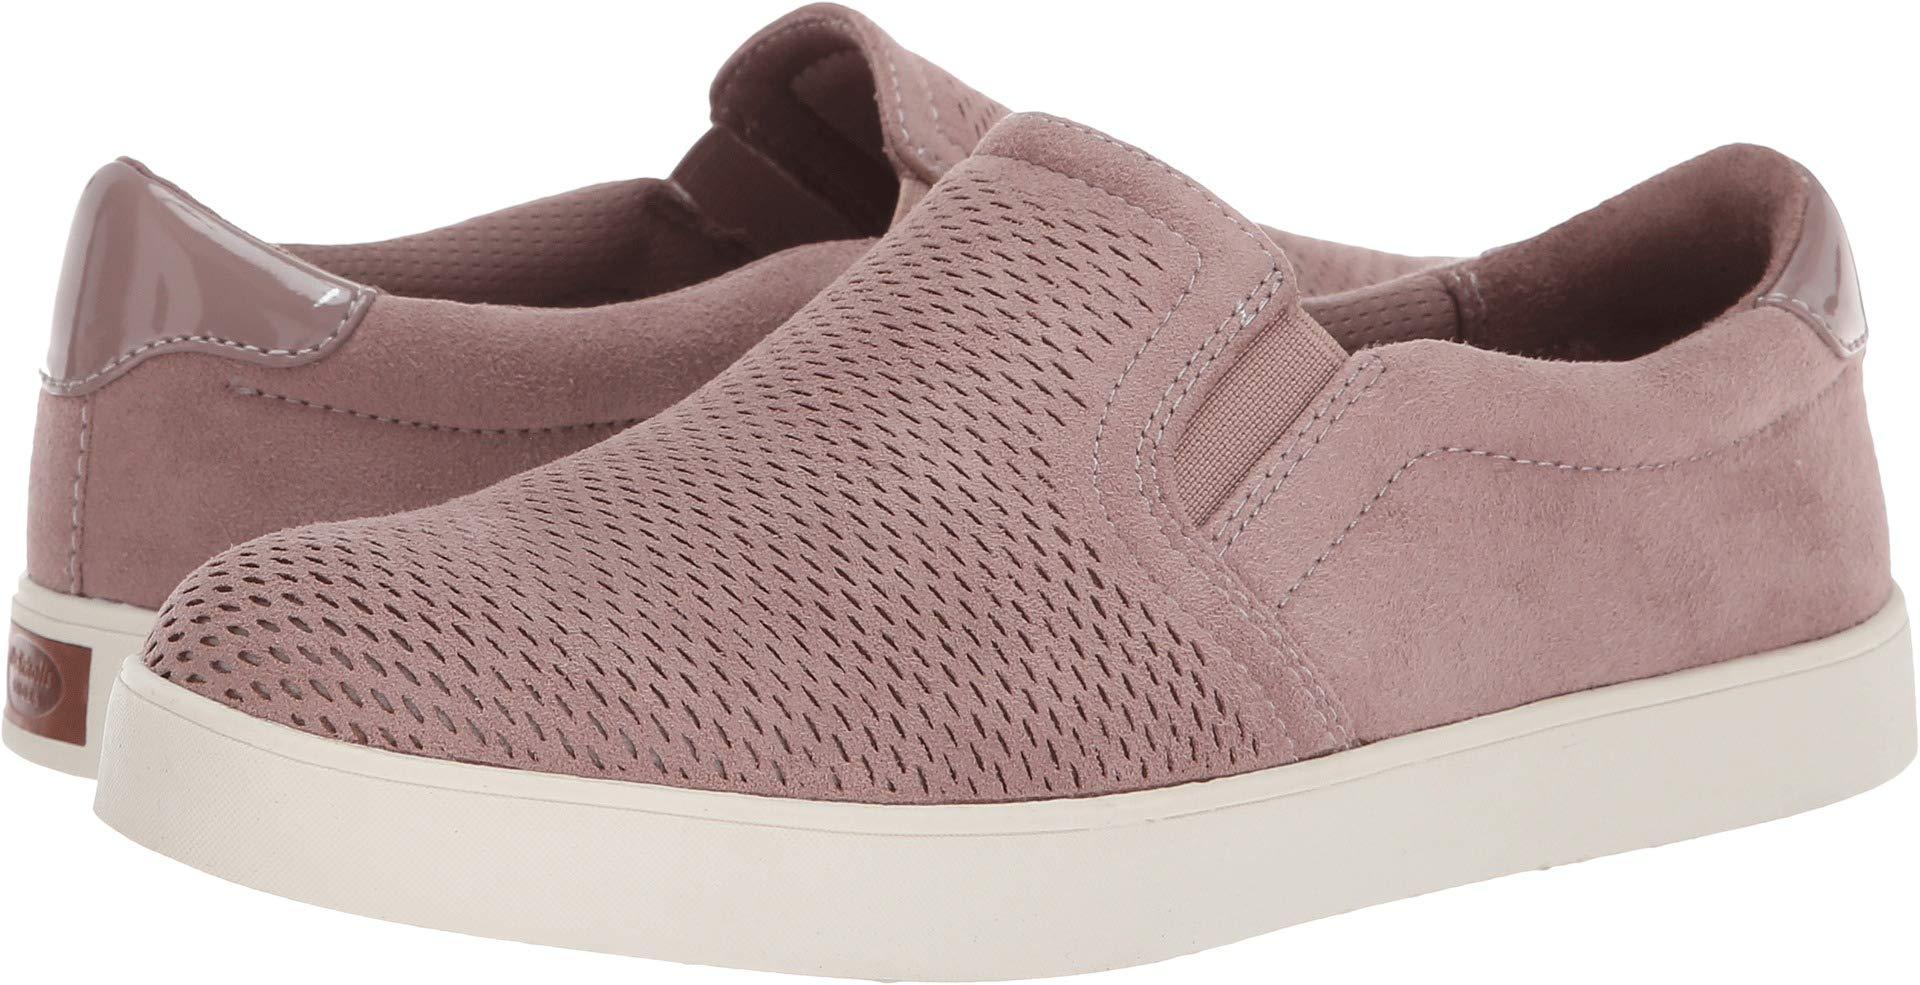 Dr. Scholl's Shoes Women's Madison Sneaker, Hydrangea Chop Microfiber, 10 M US